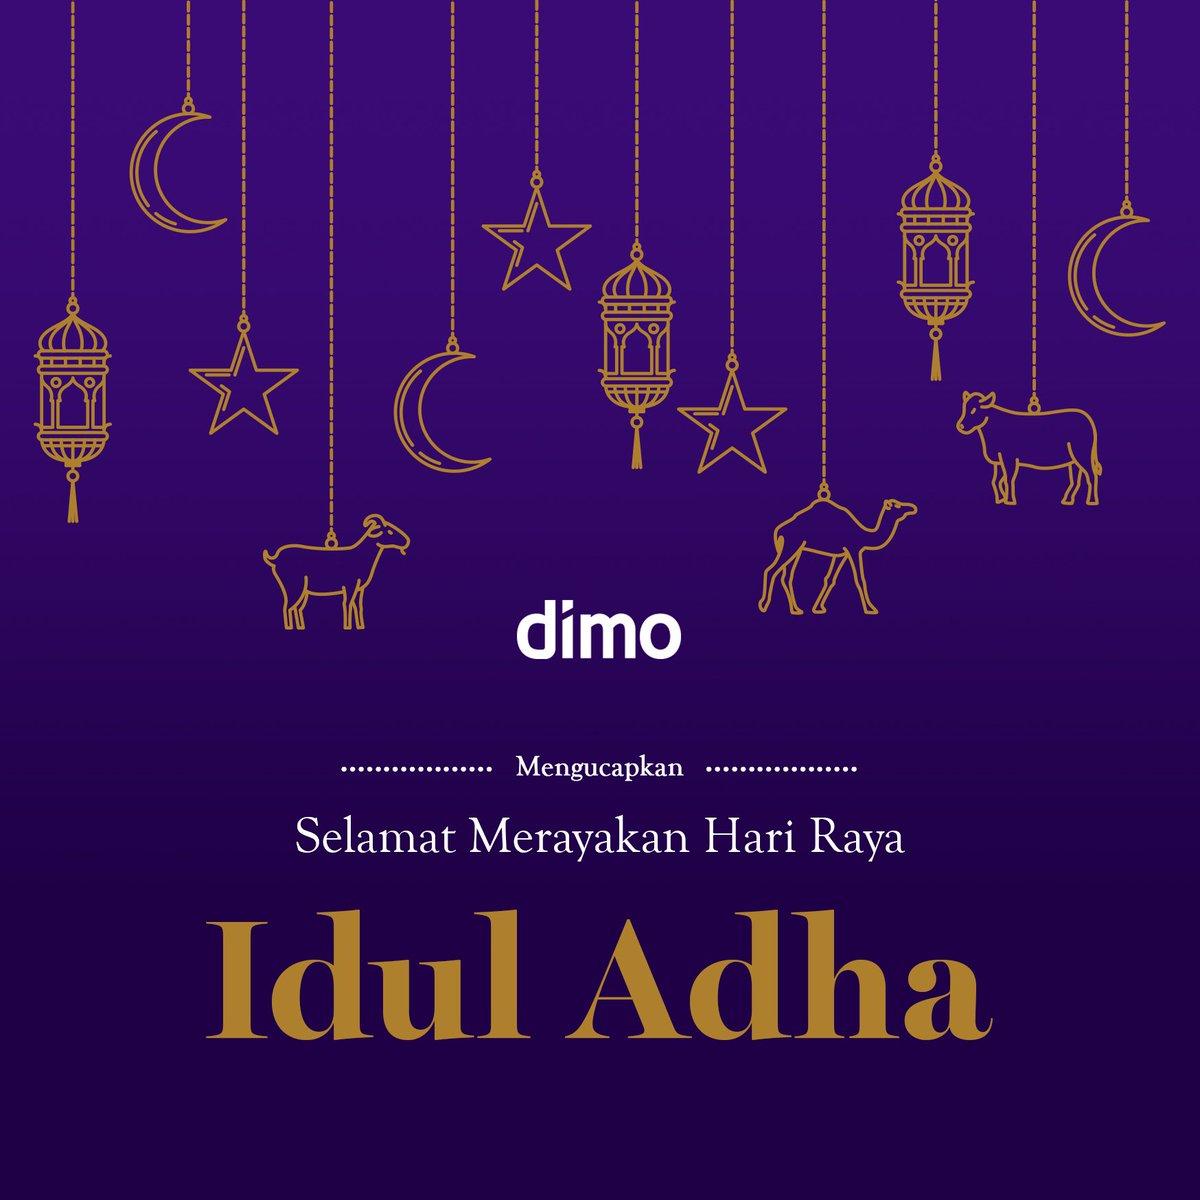 Go Pay Indonesia: Dimo Pay Indonesia (@DimoPay)